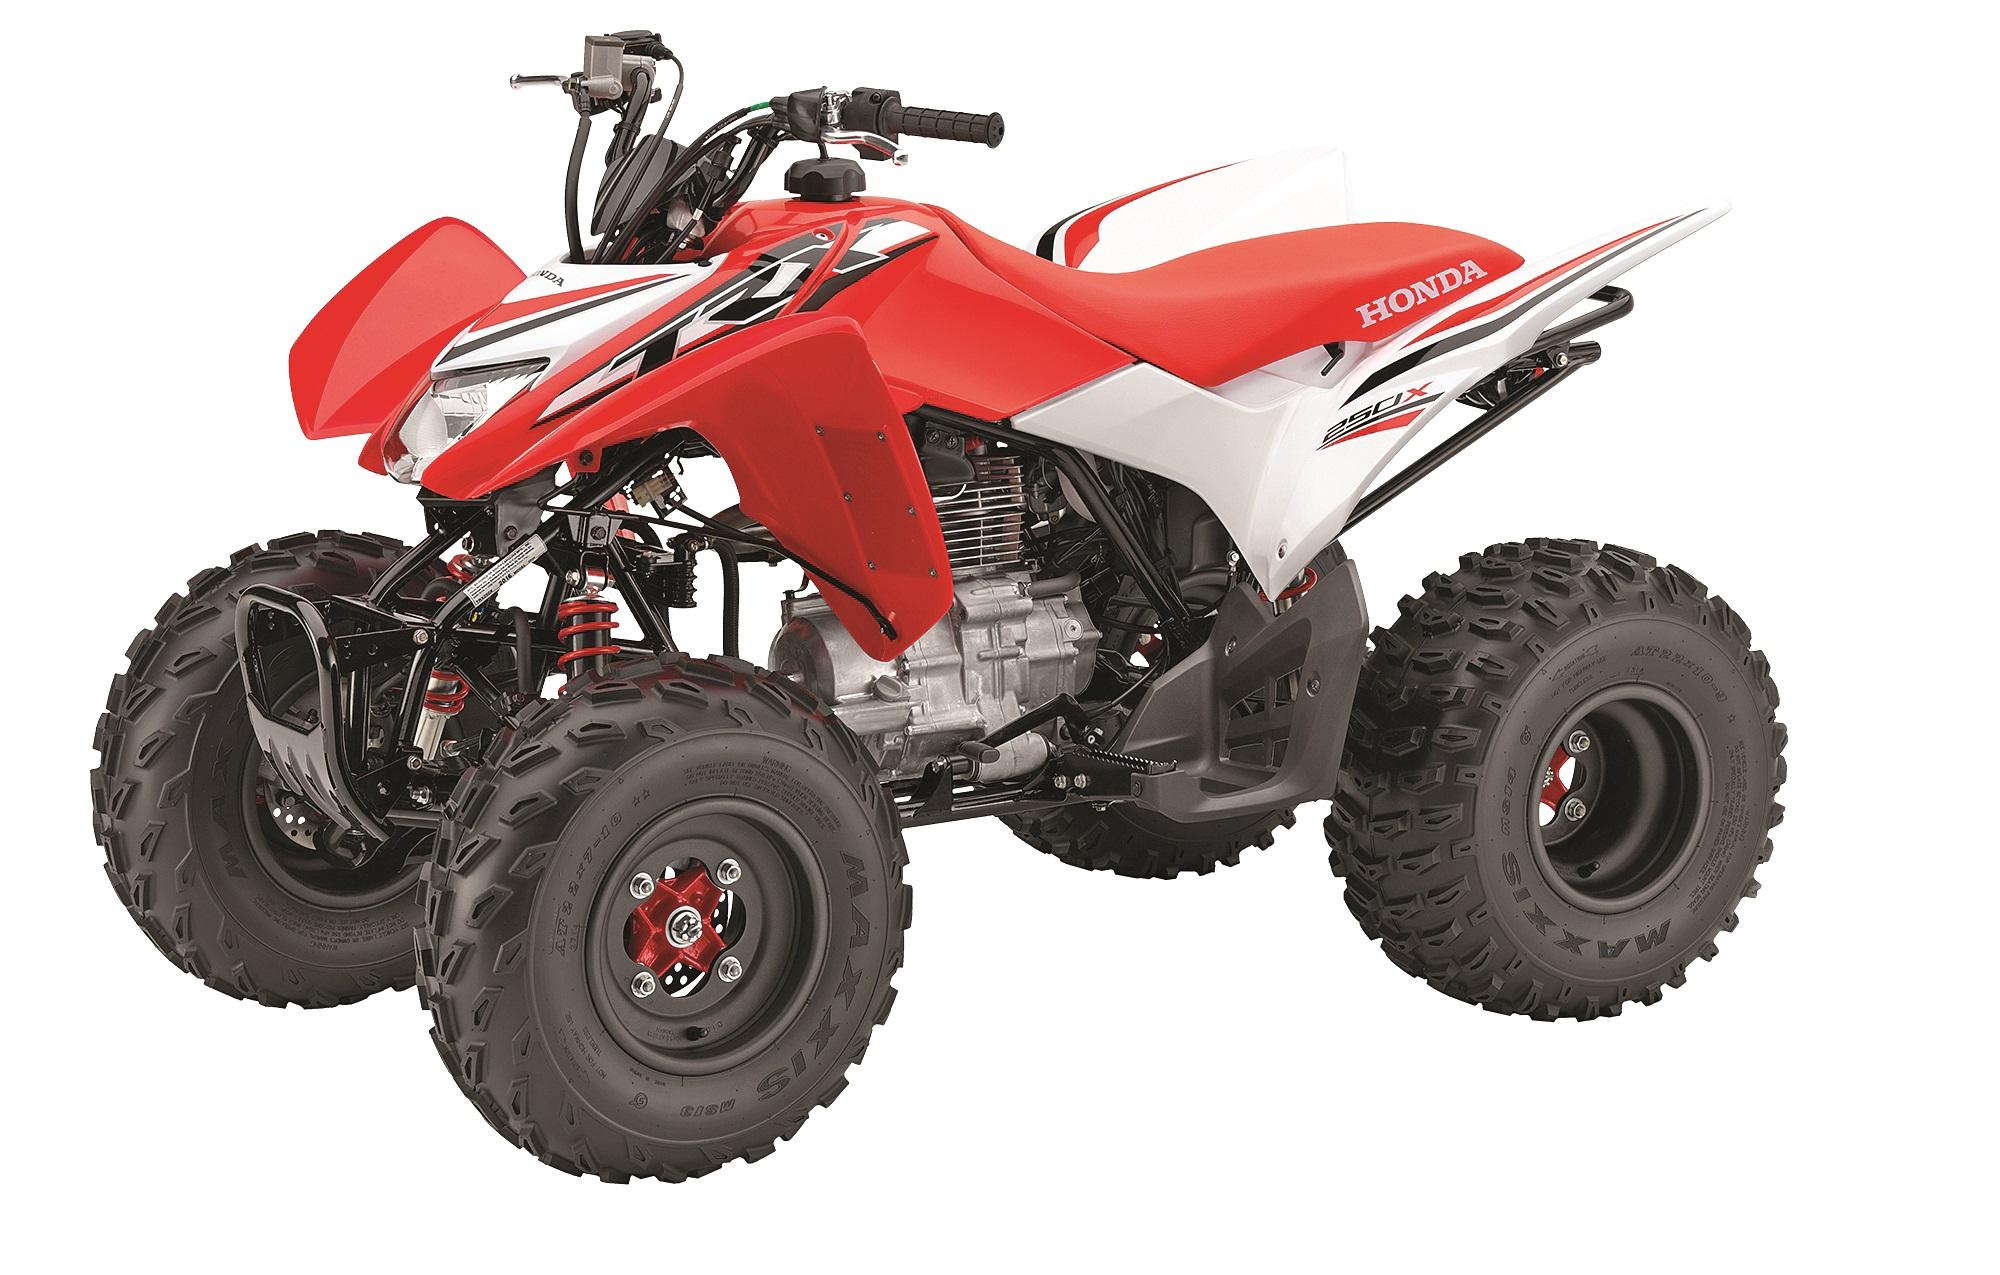 2016 Honda TRX250X Deluxe